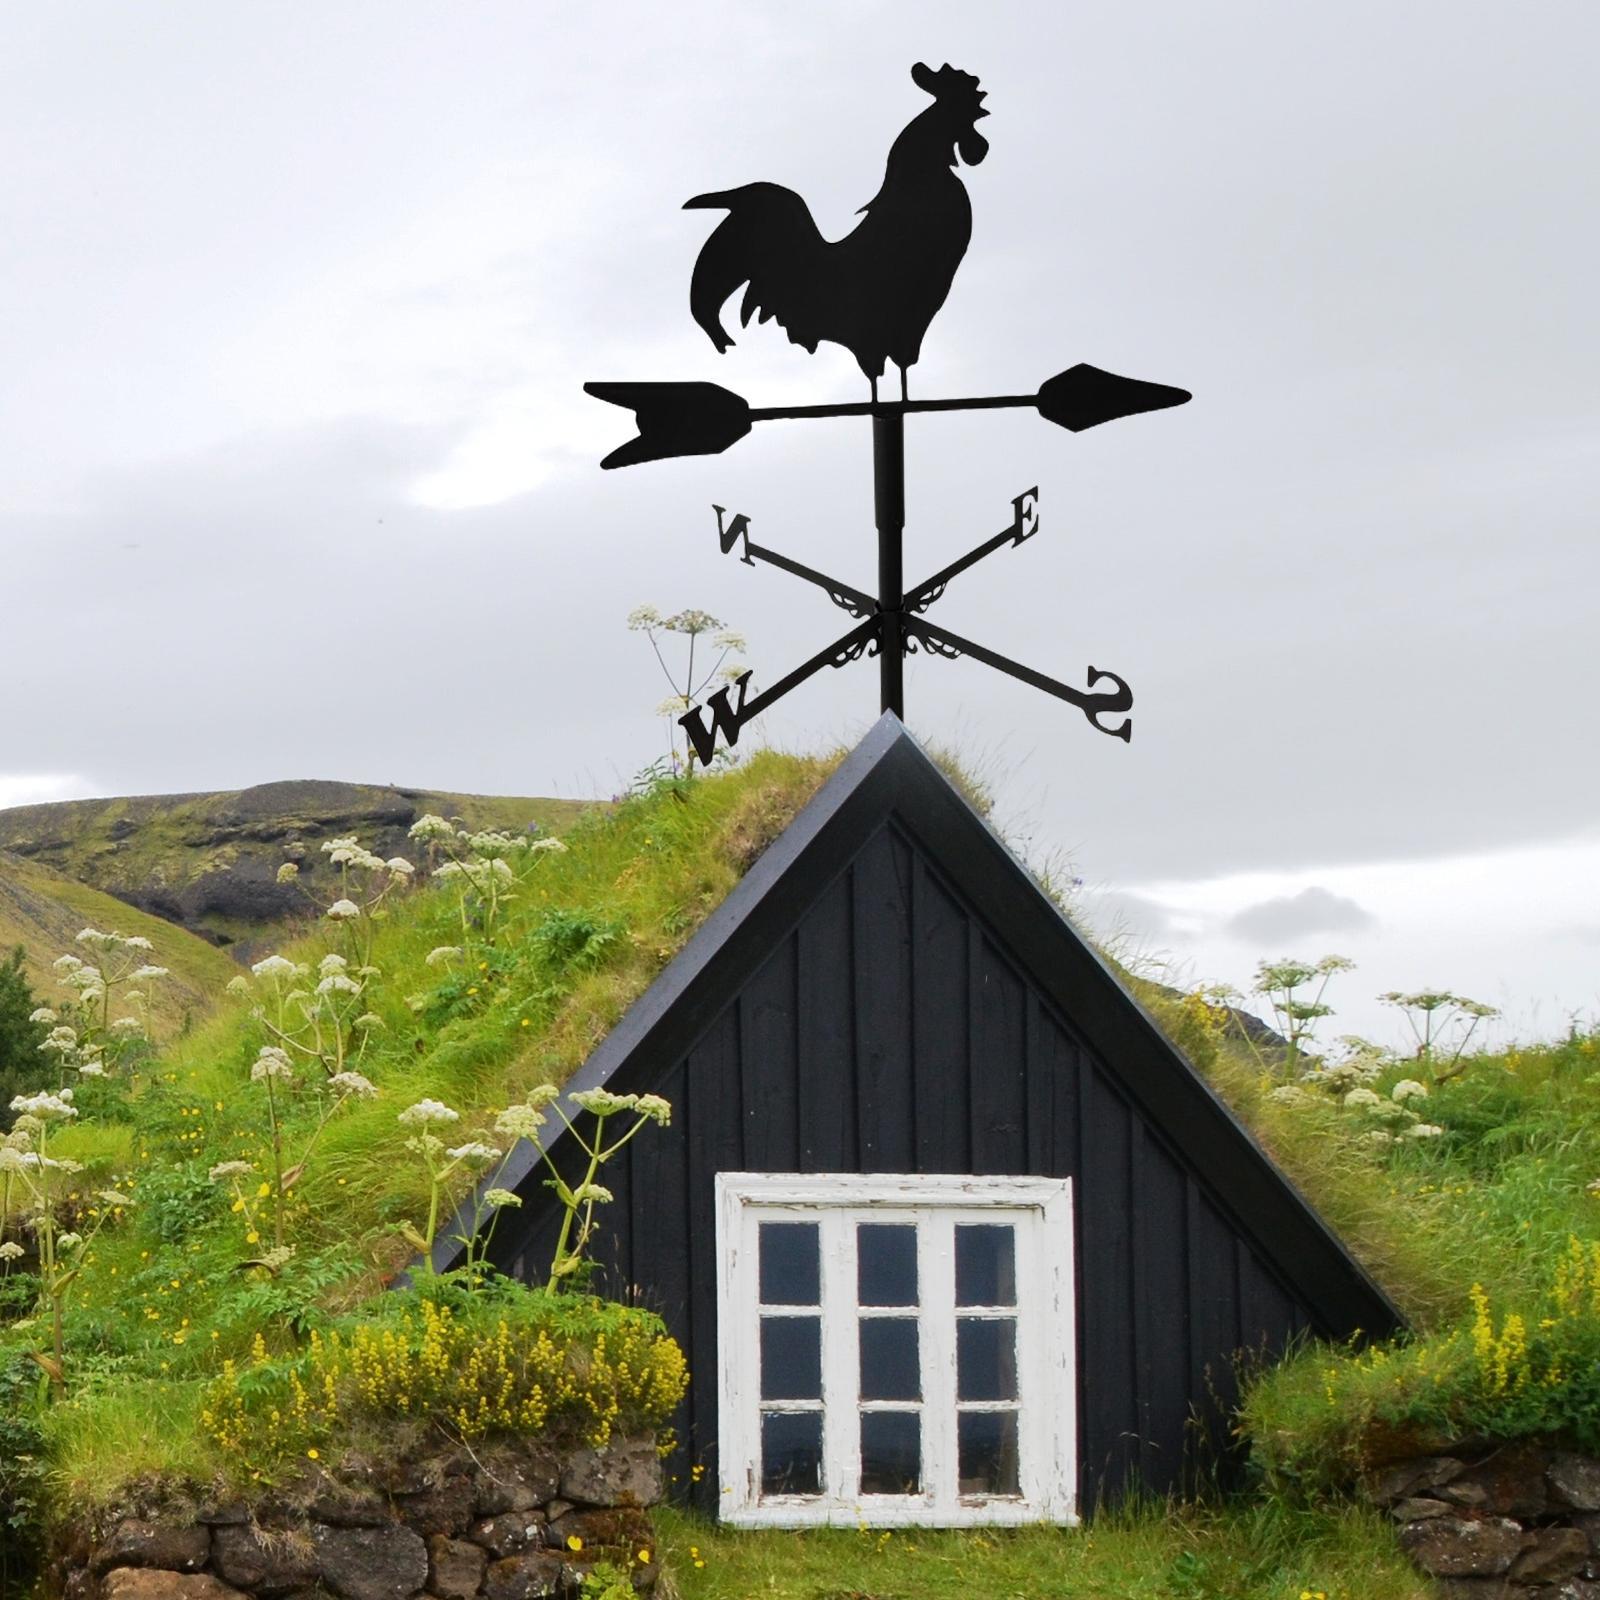 Vintage Style Metal Cock Shape Weathervane Wind Direction Indicator Decor